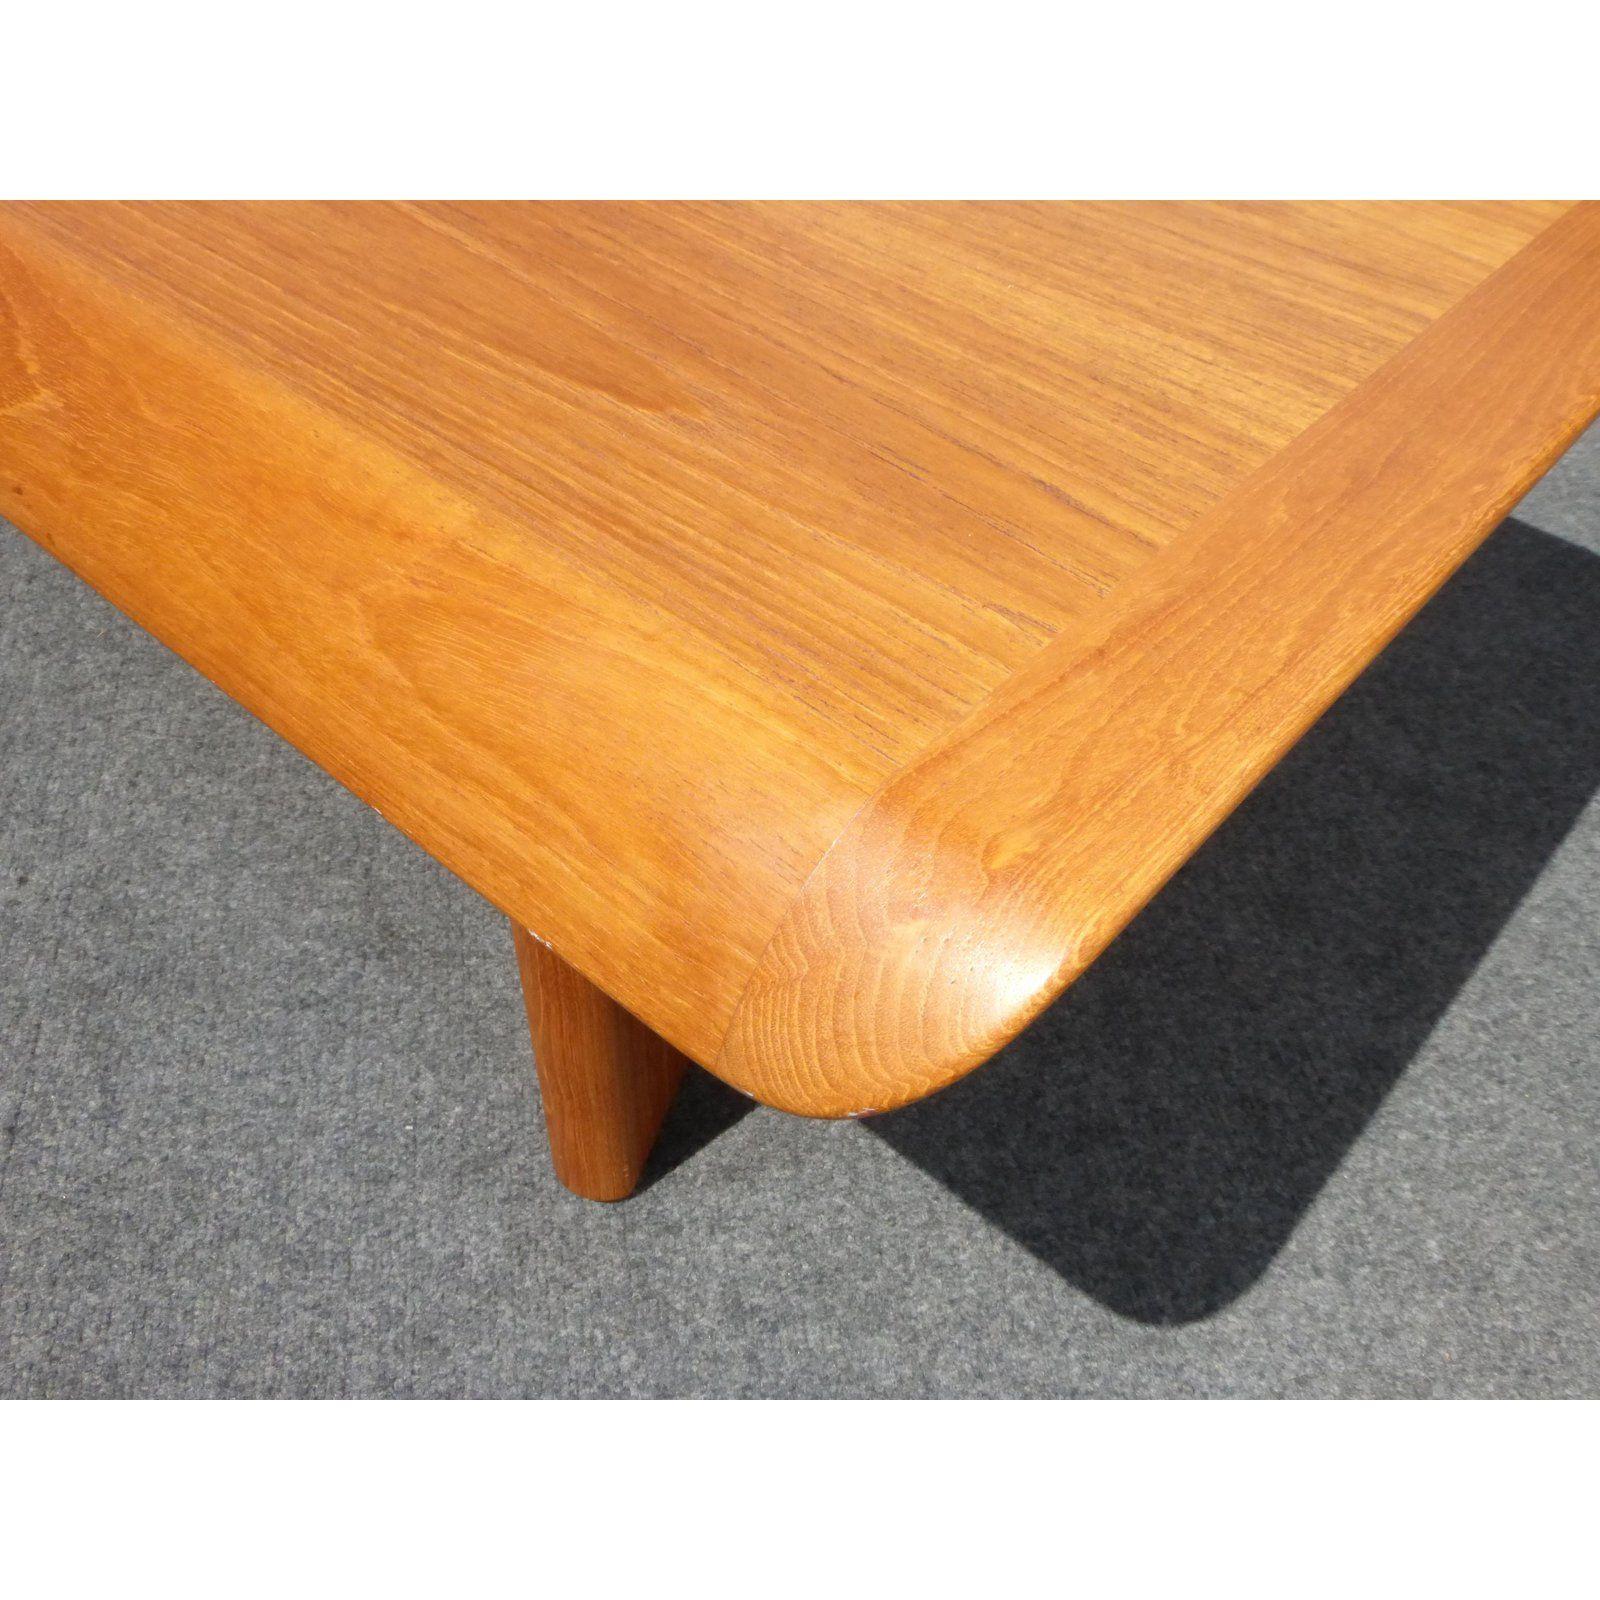 Vintage Danish Modern Teak Coffee Table Made In Canada By Nordic Furniture Nordic Furniture Teak Coffee Table Coffee Table